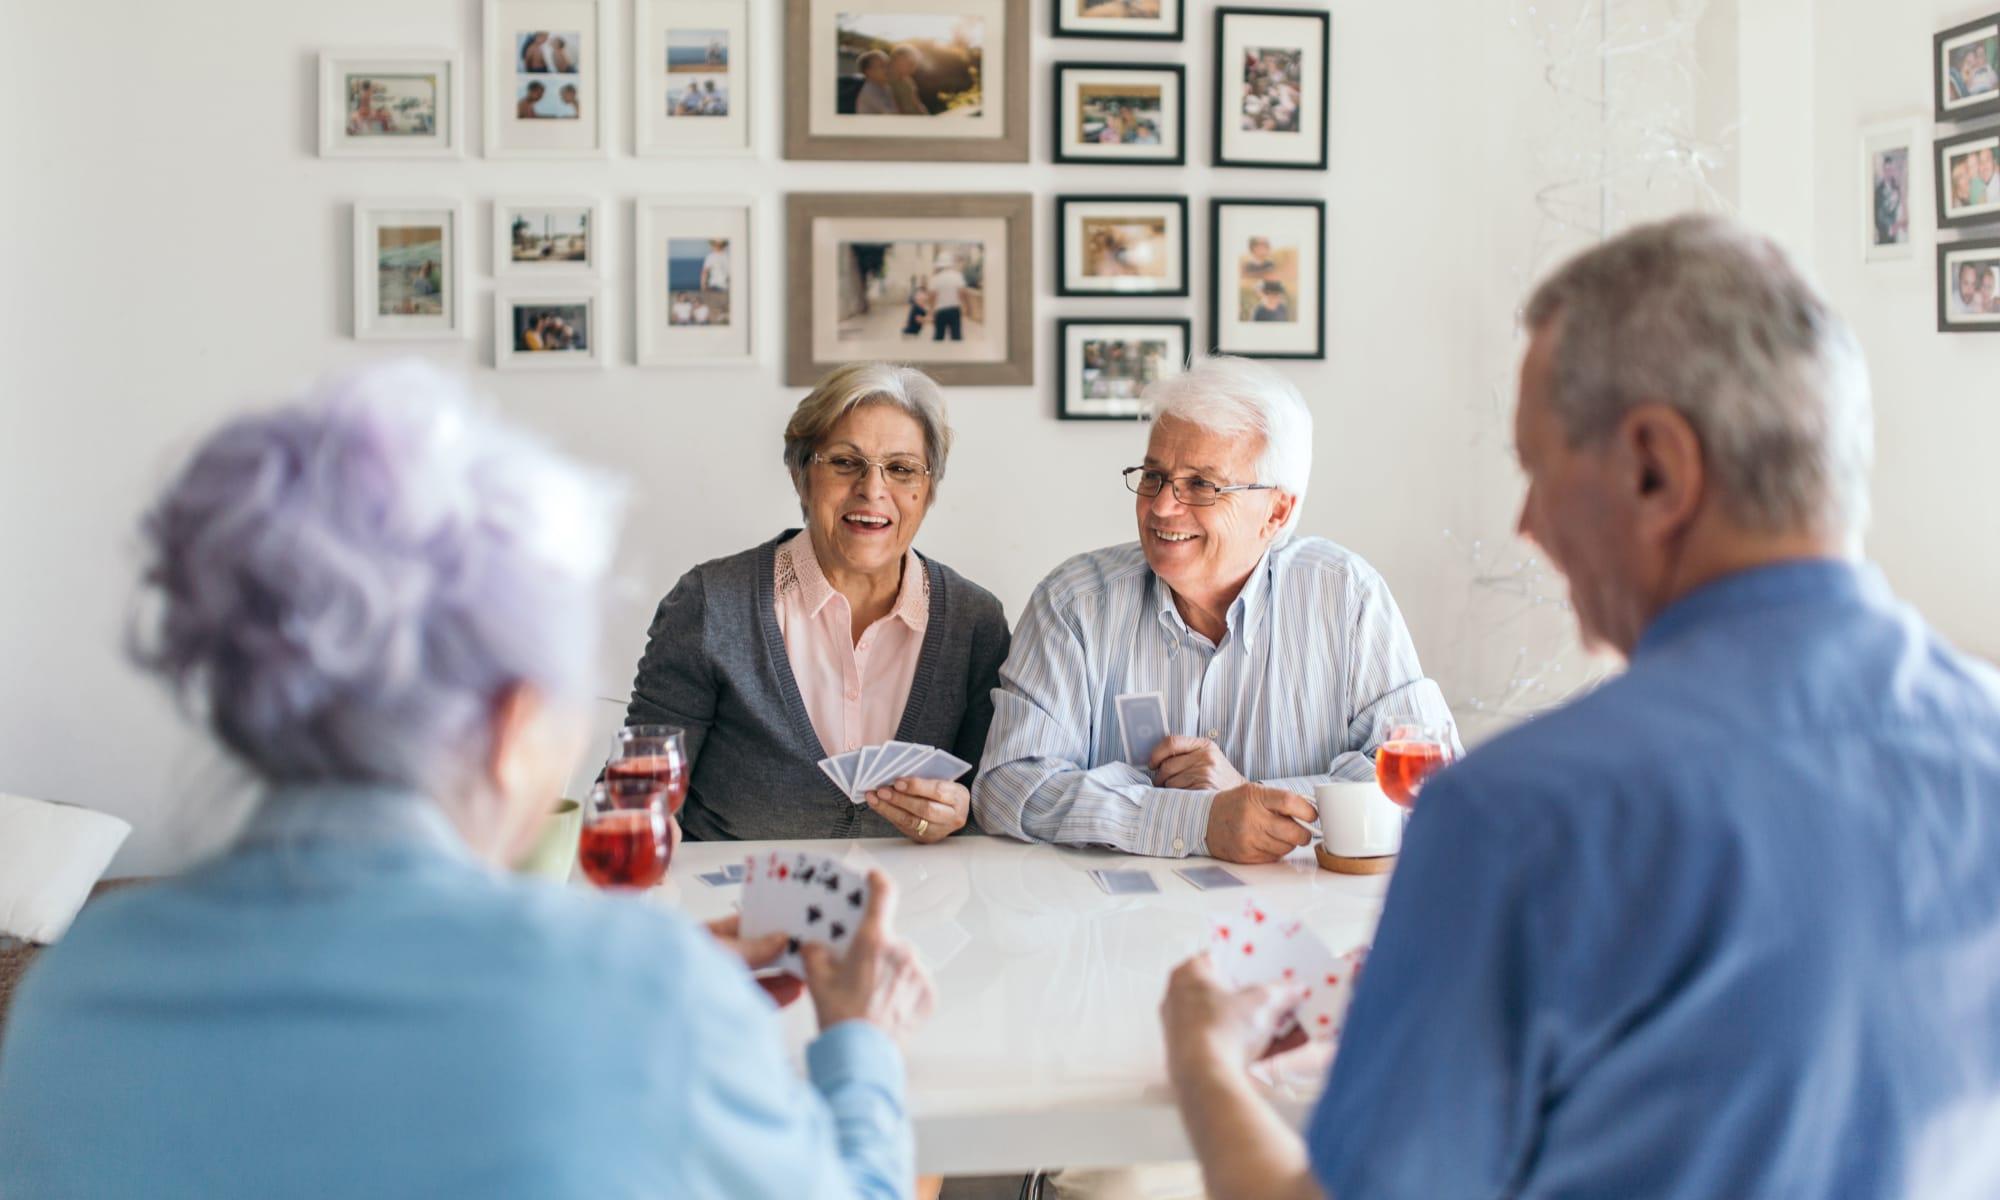 Residents playing cards at Broadwell Senior Living in Kearney, Nebraska